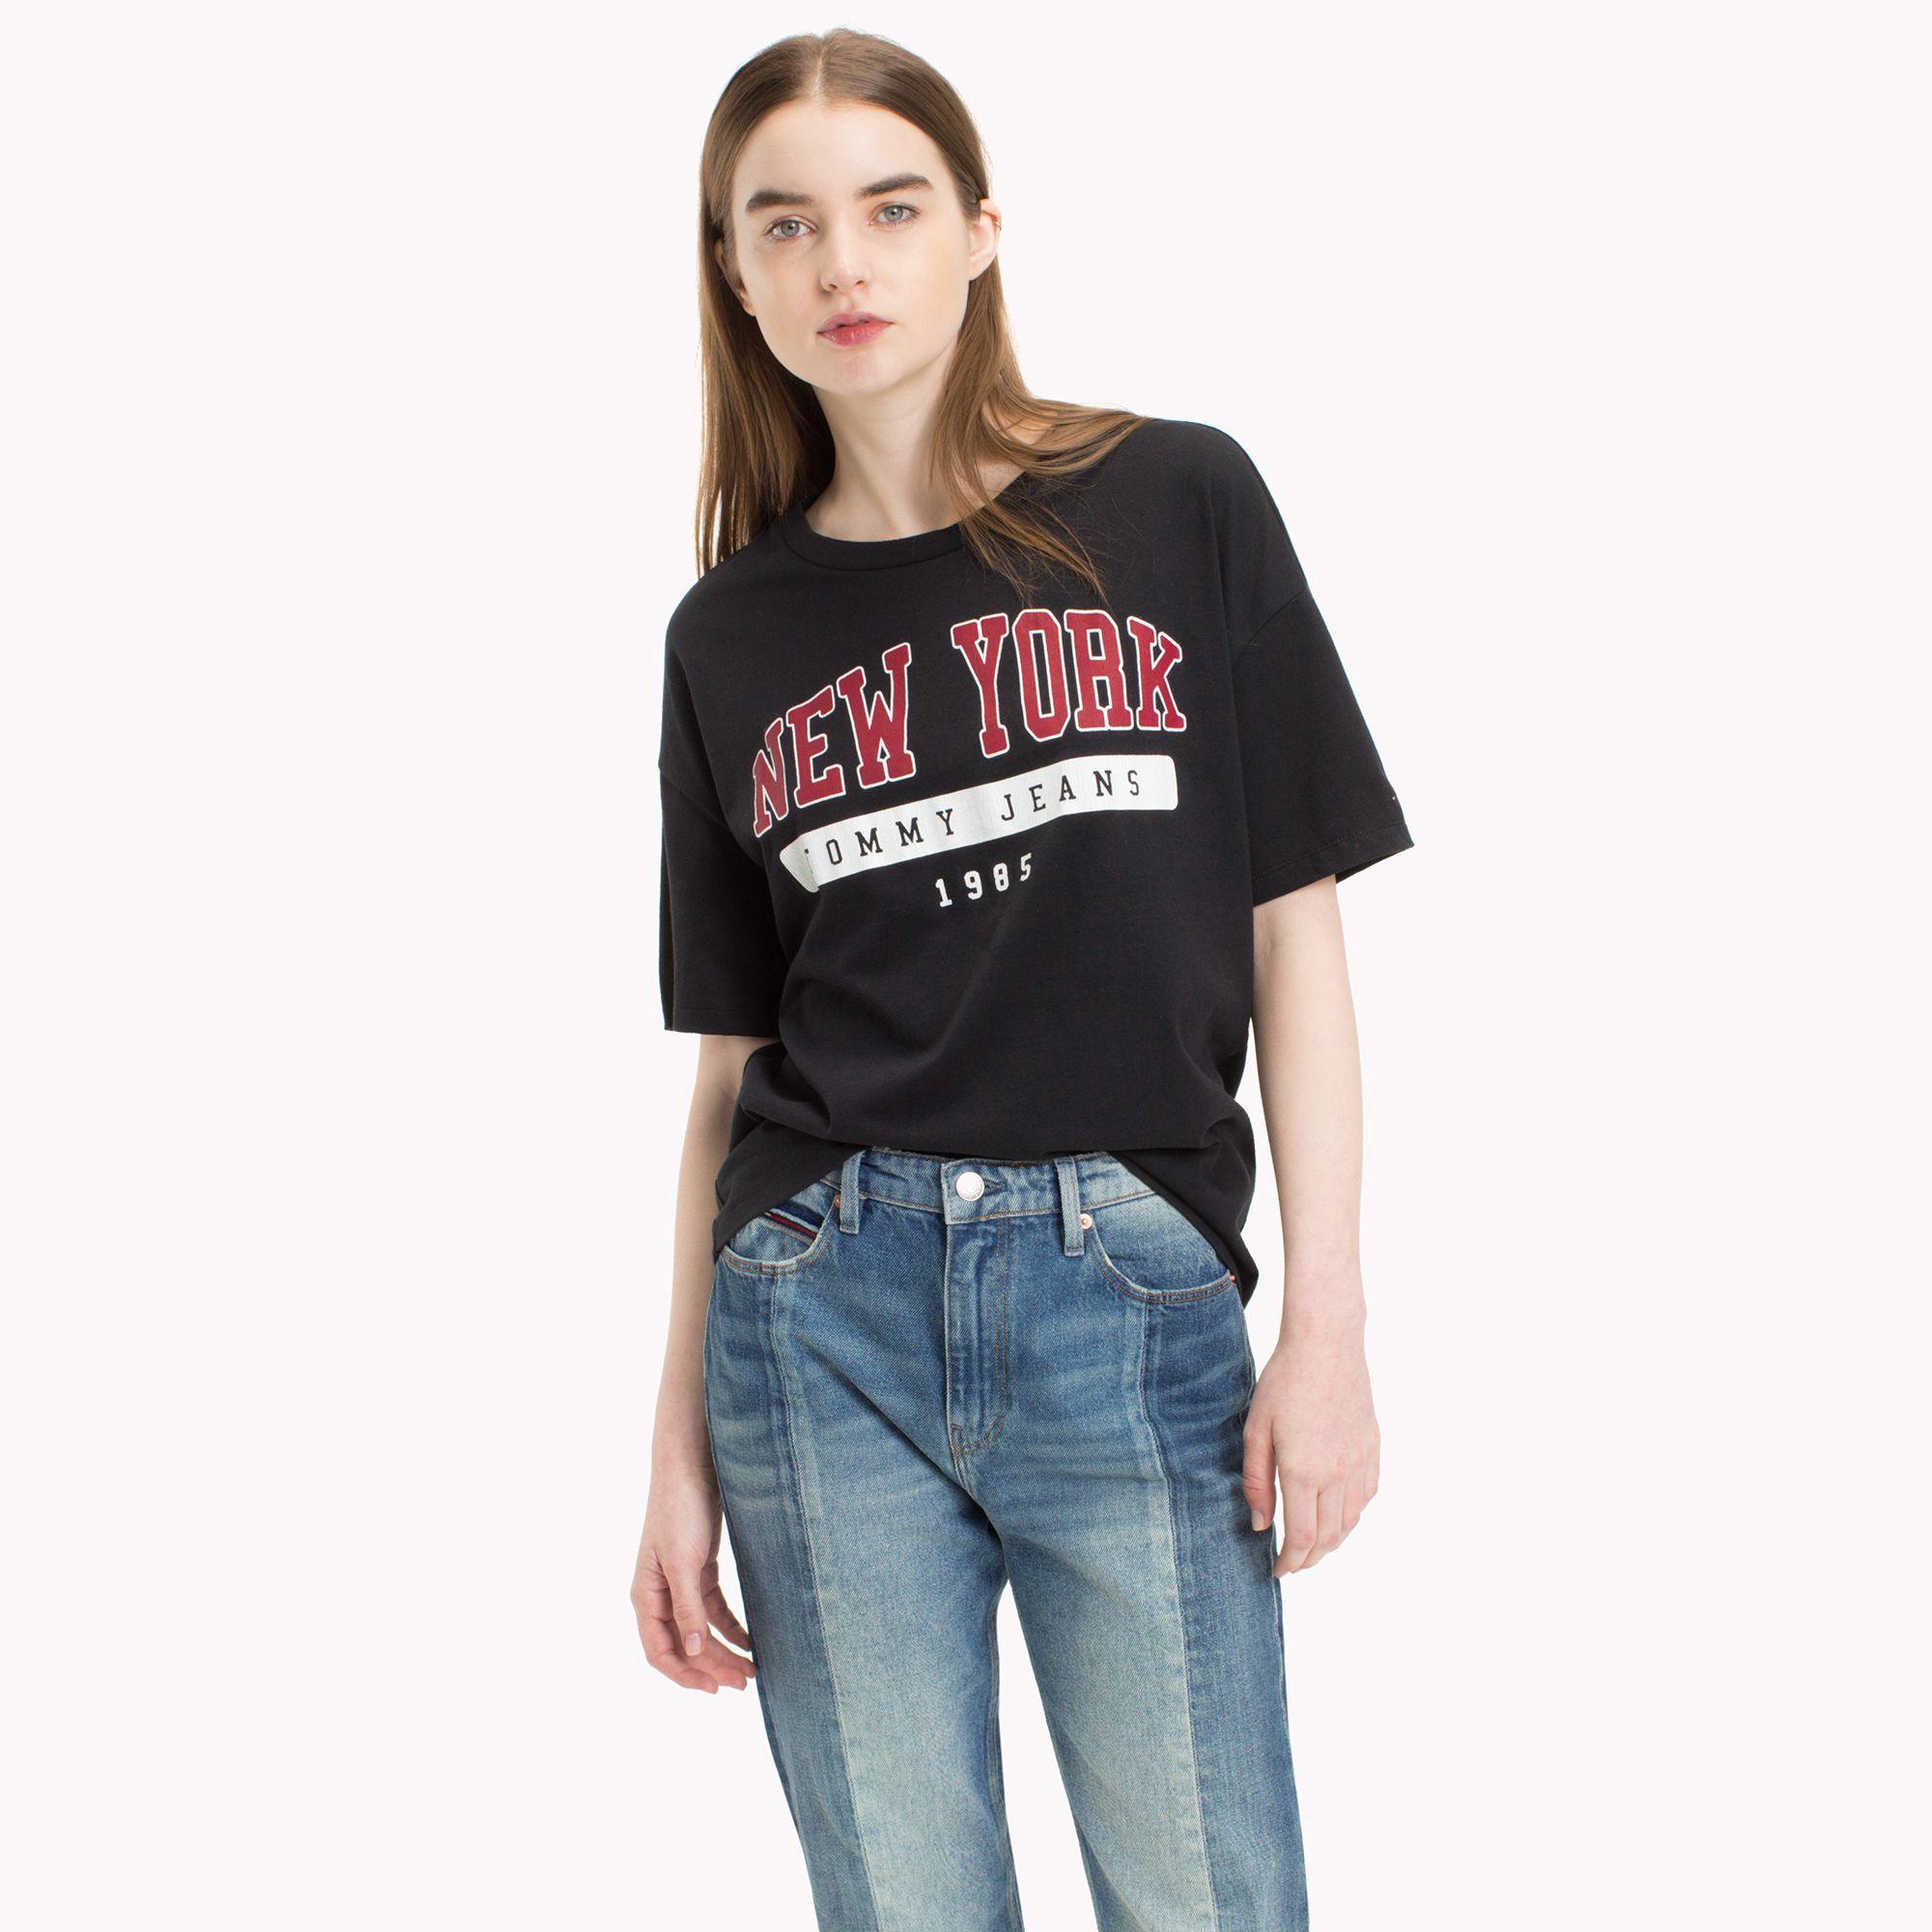 45f83017 Boyfriend New York T-Shirt by Tommy Hilfiger | Products | Tommy ...